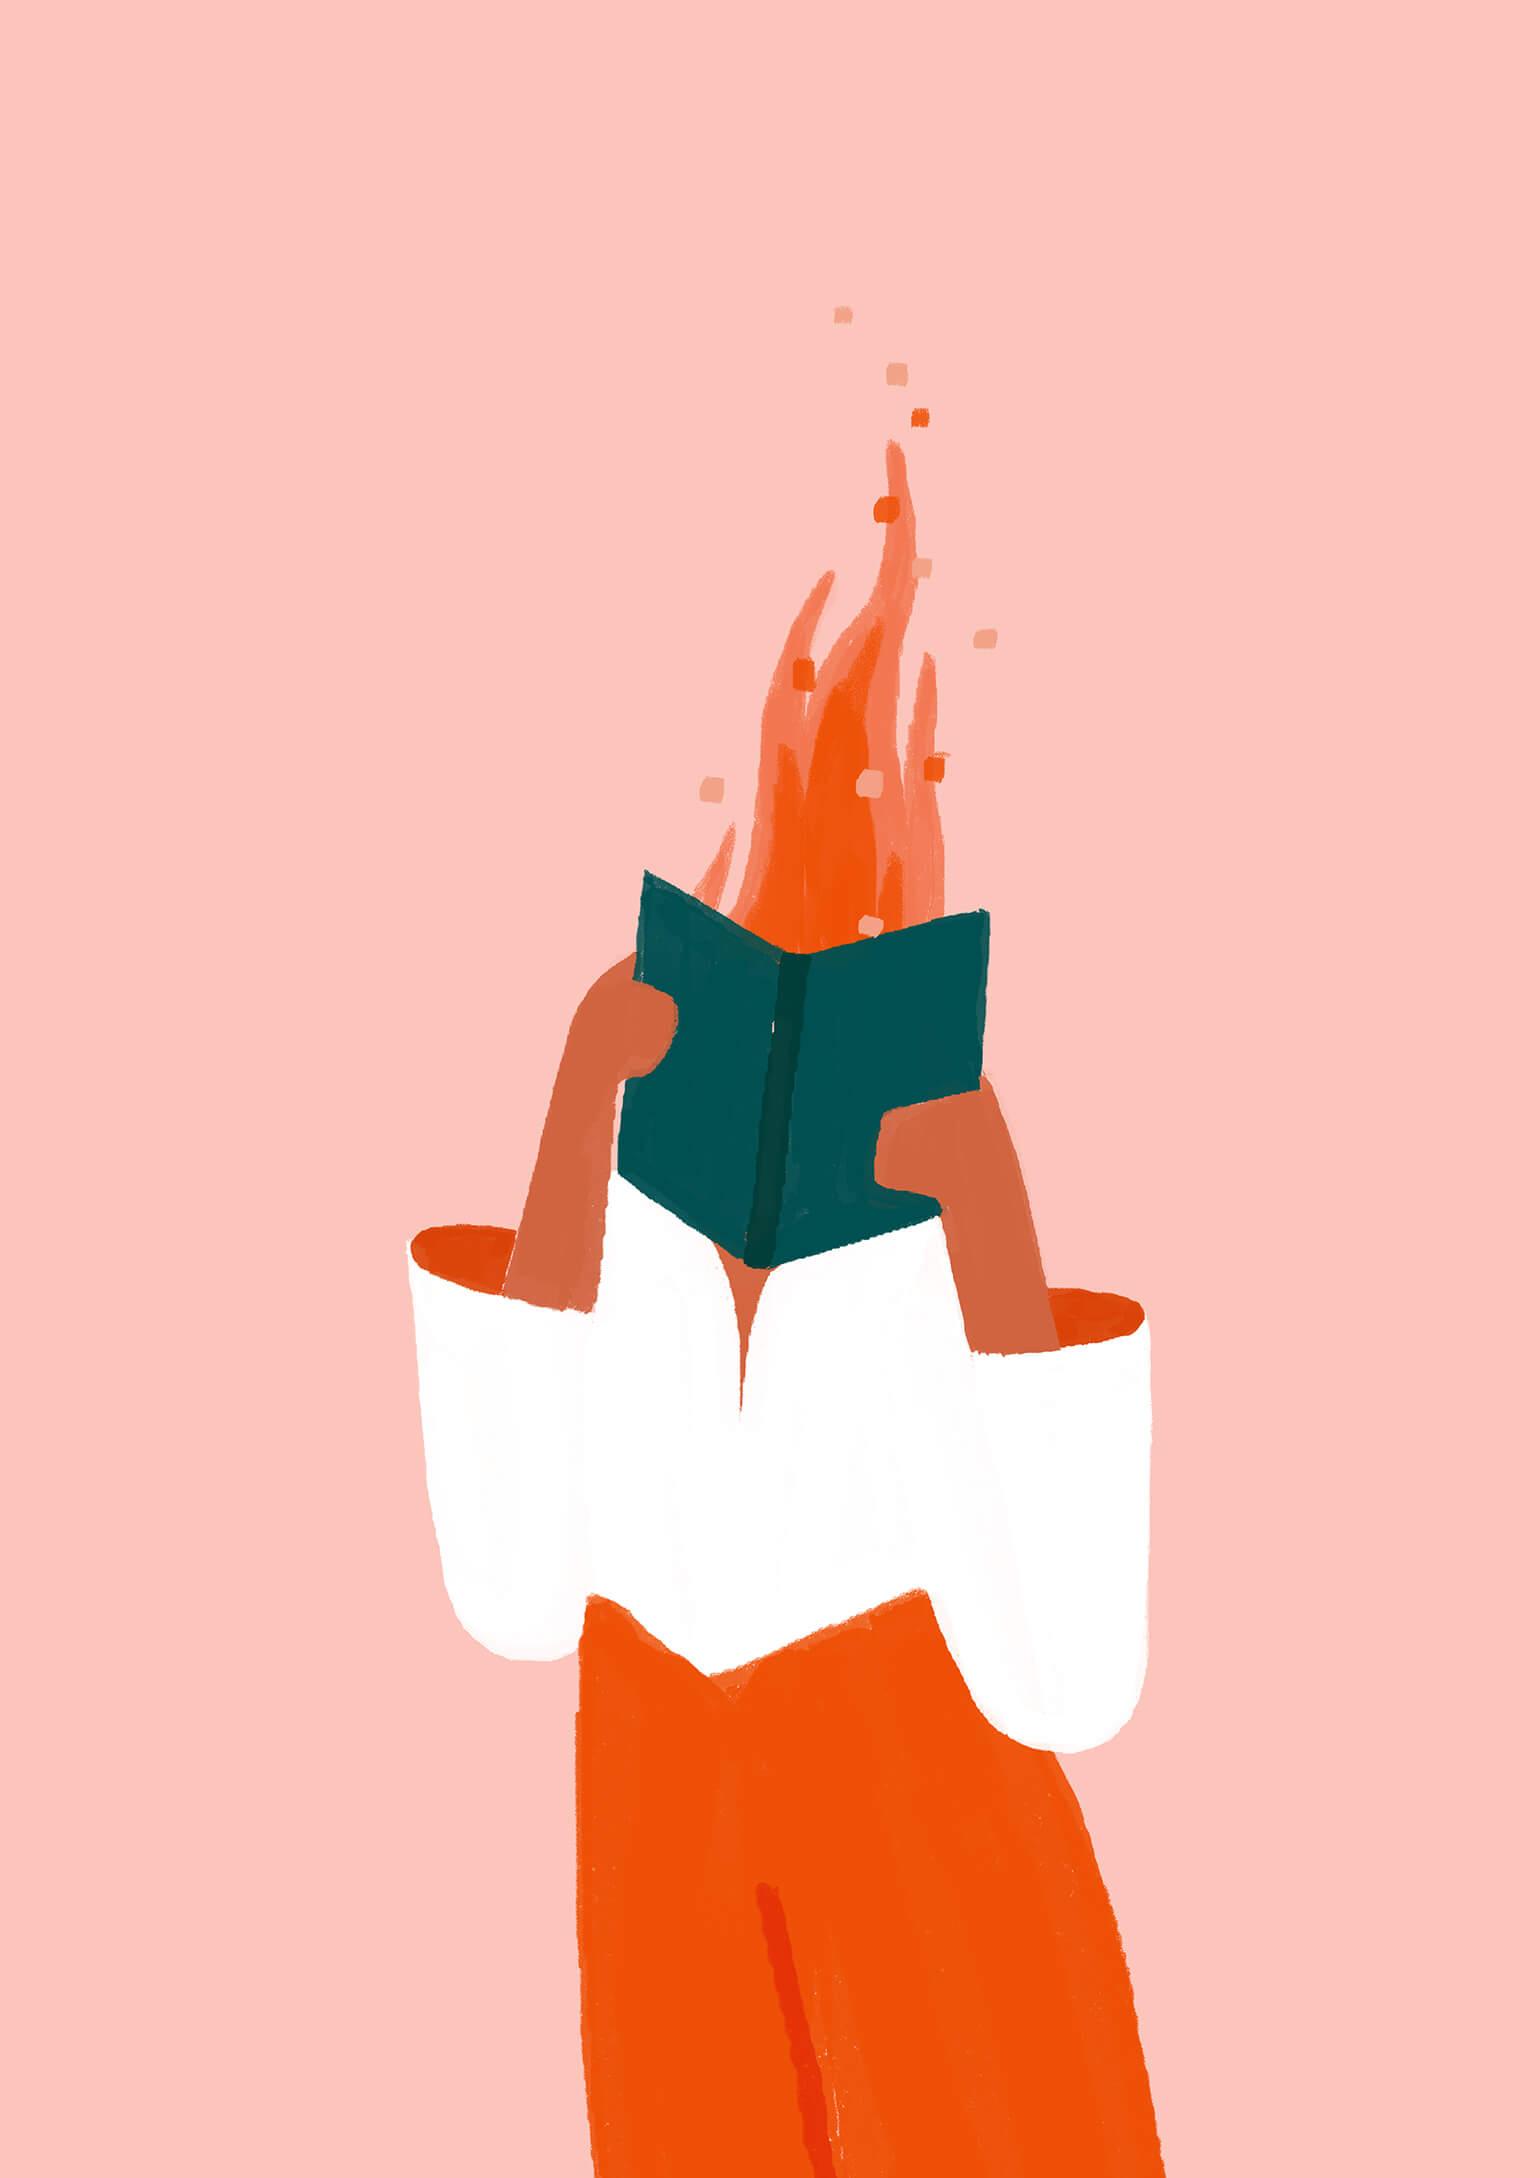 reading-on-fire-woman-illustration-violeta-noy